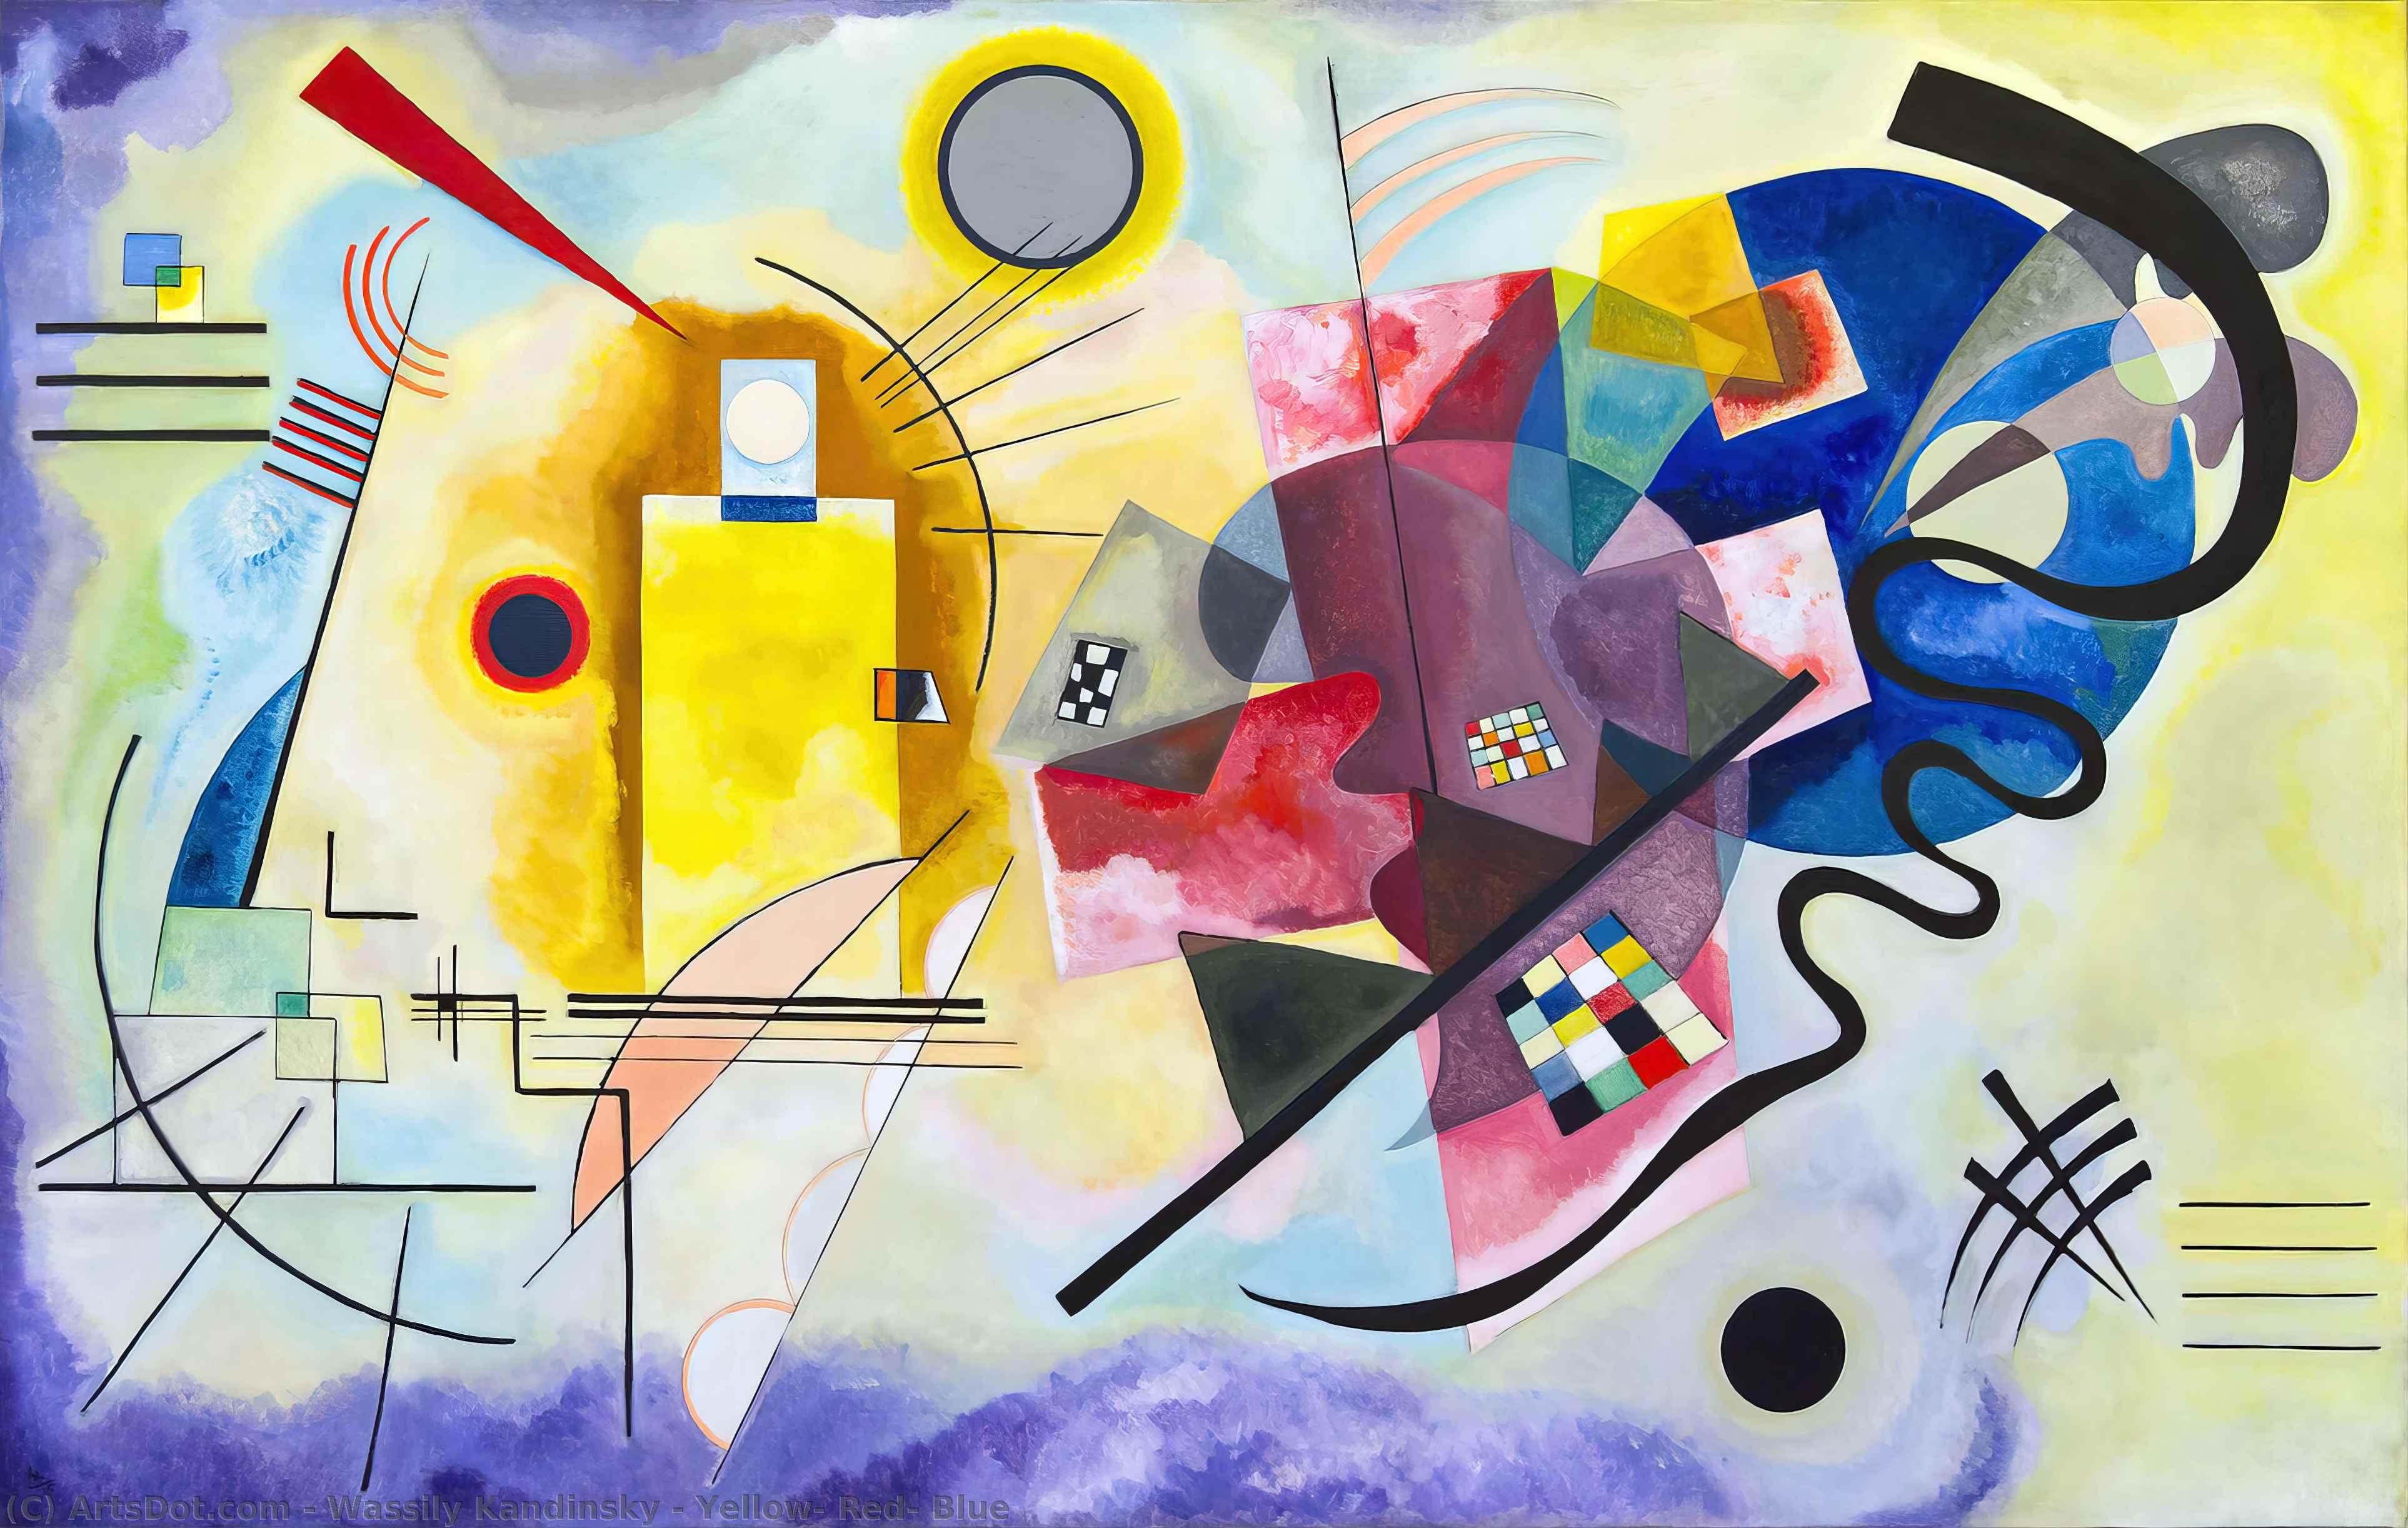 Wikoo.org - موسوعة الفنون الجميلة - اللوحة، العمل الفني Wassily Kandinsky - Yellow, Red, Blue